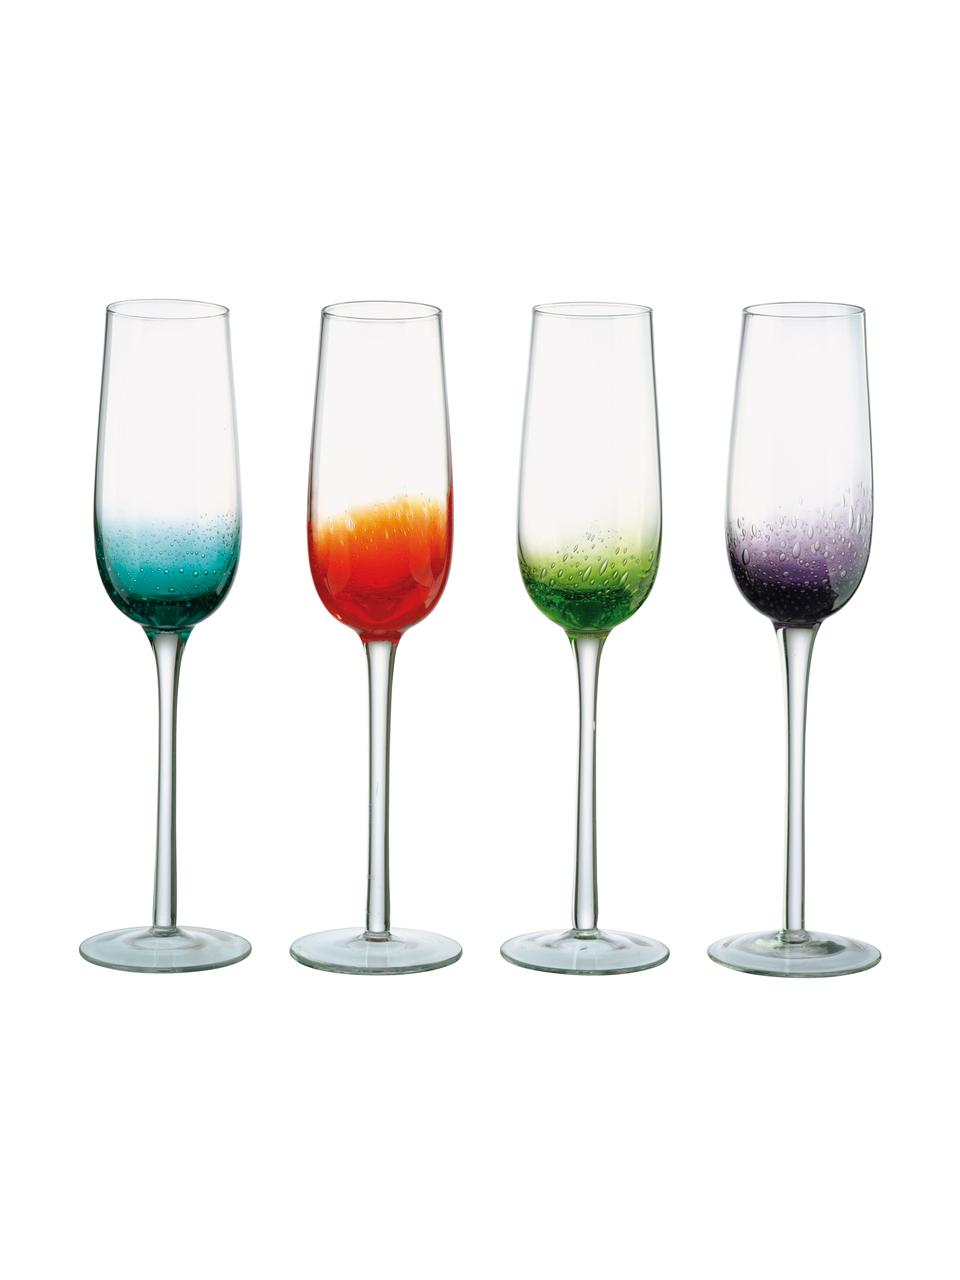 Mondgeblazen champagneglazen Fizz in verschillende kleuren, 4-delig, Mondgeblazen glas, Transparant, multicolour, 250 ml